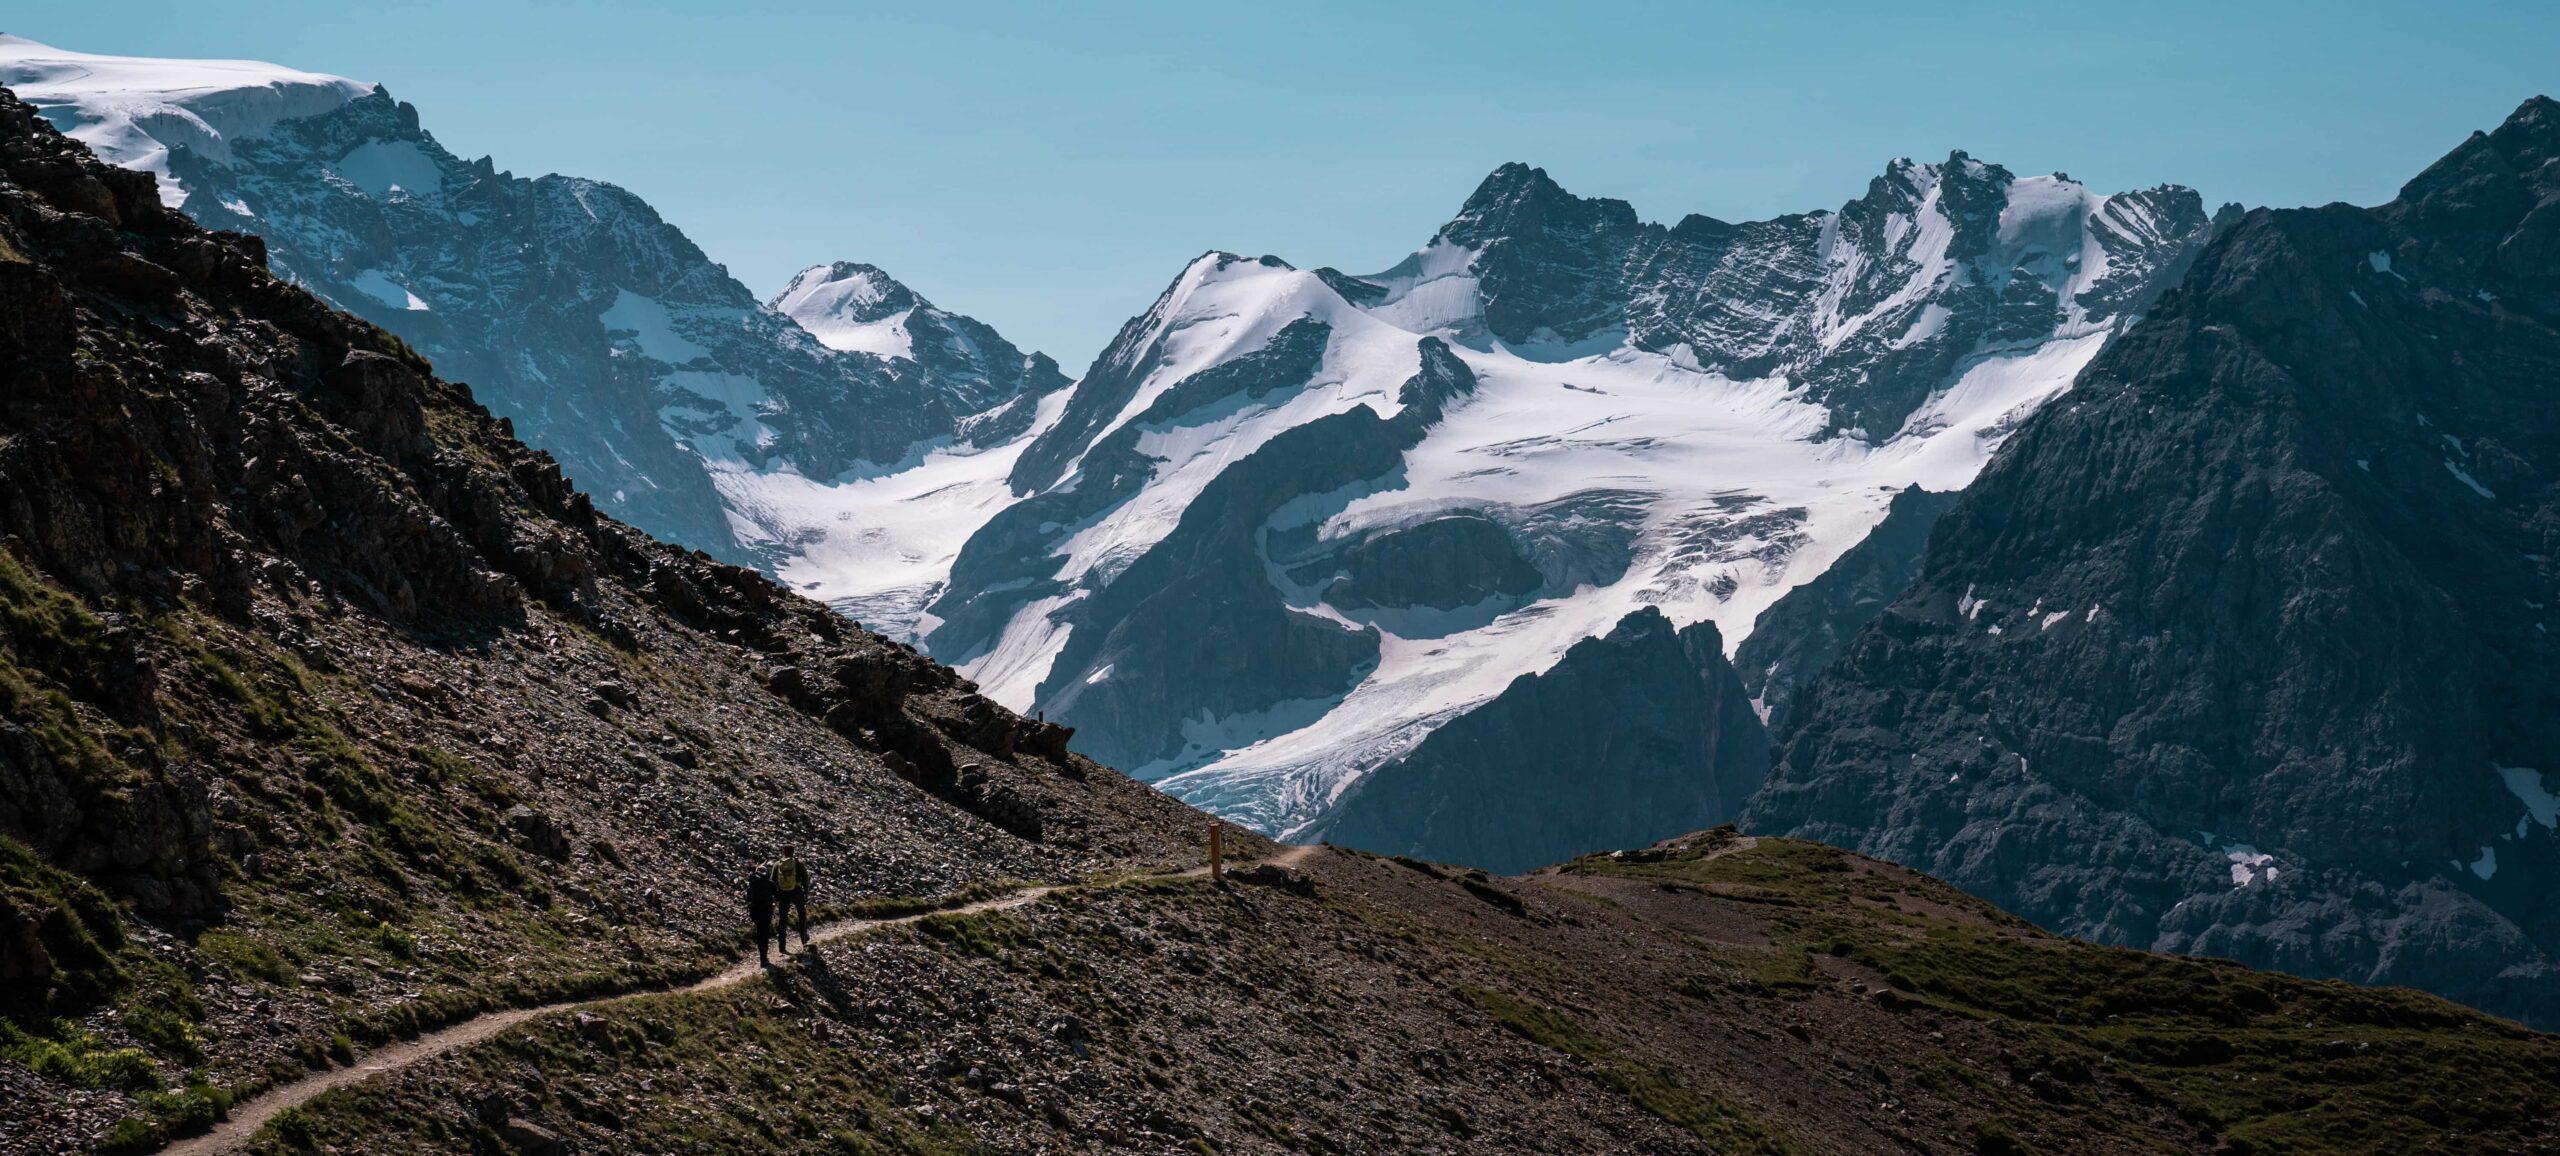 Trekking in Montagna sulla via dell'Ortles